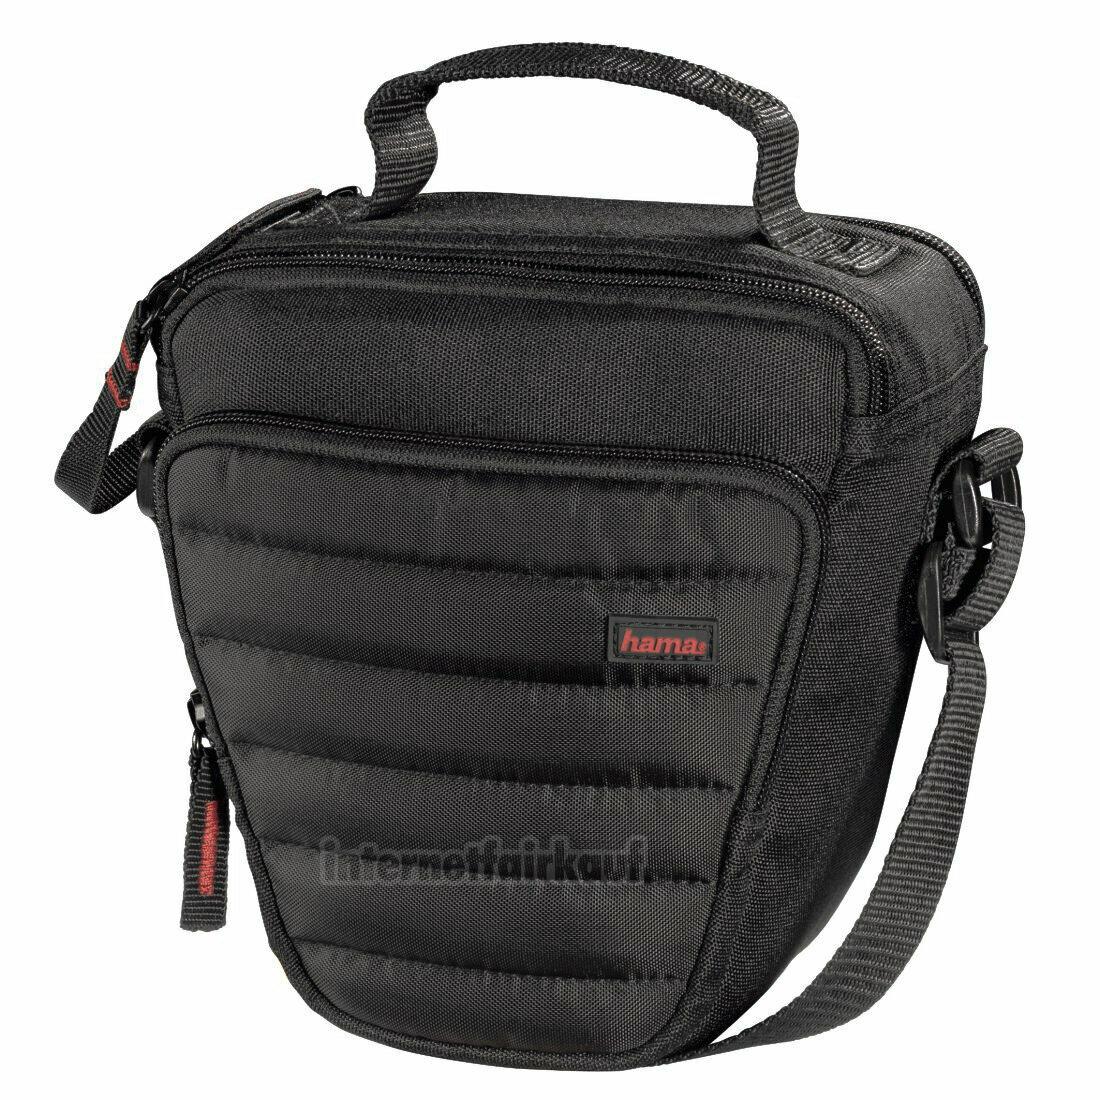 Fototasche passend für Canon EOS 100D 1000D 1100D - Kameratasche